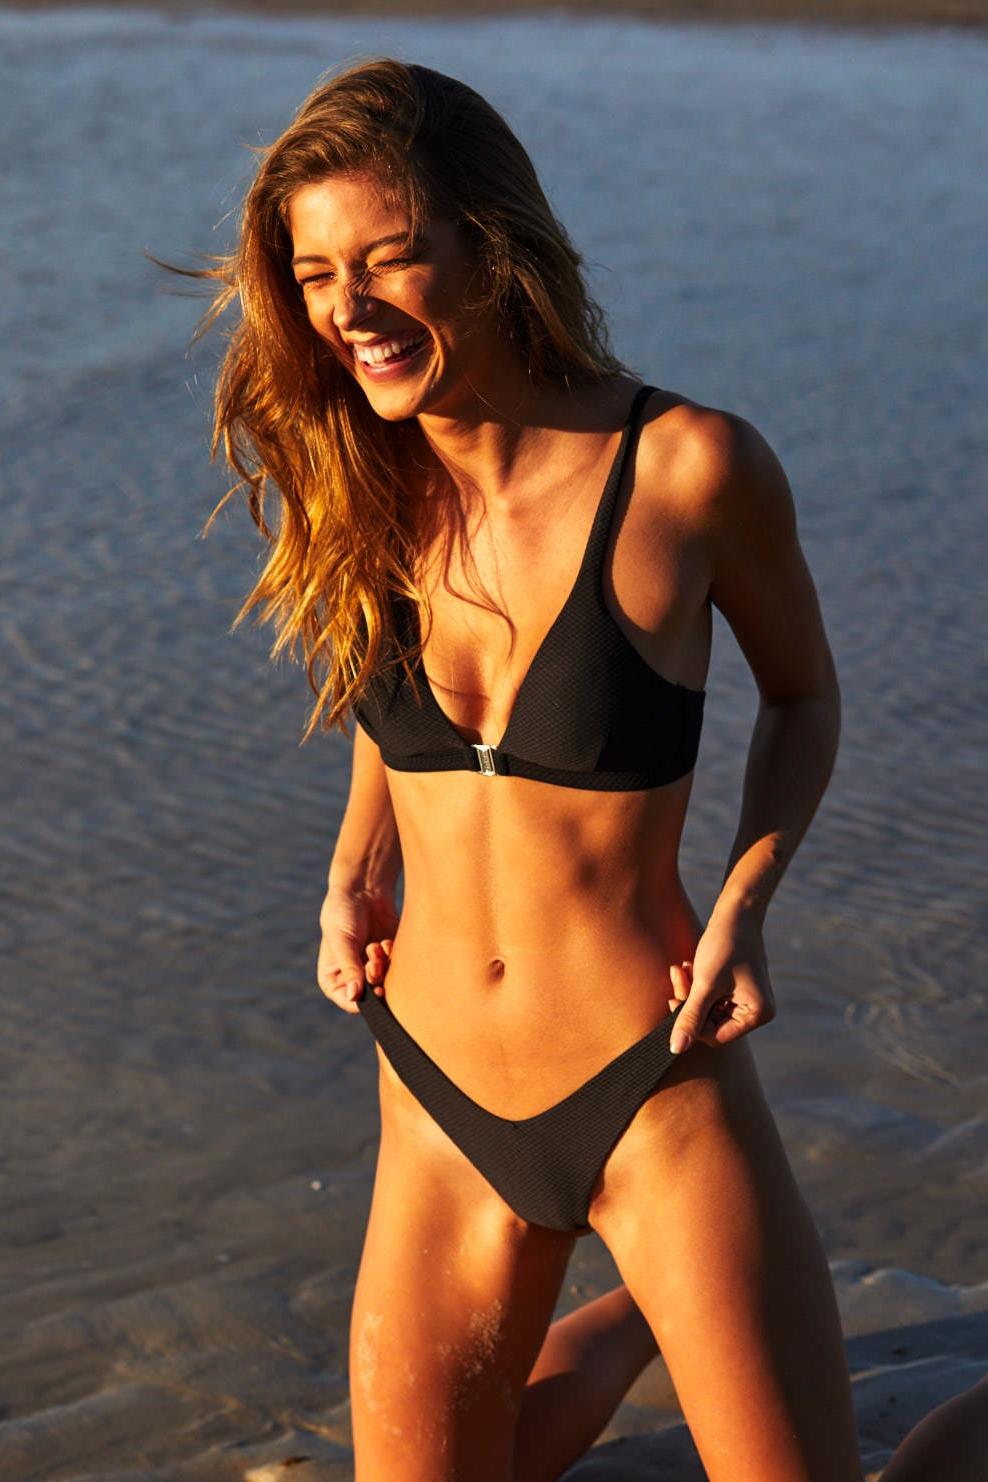 Bikini Naomi Holt nudes (92 photo), Leaked